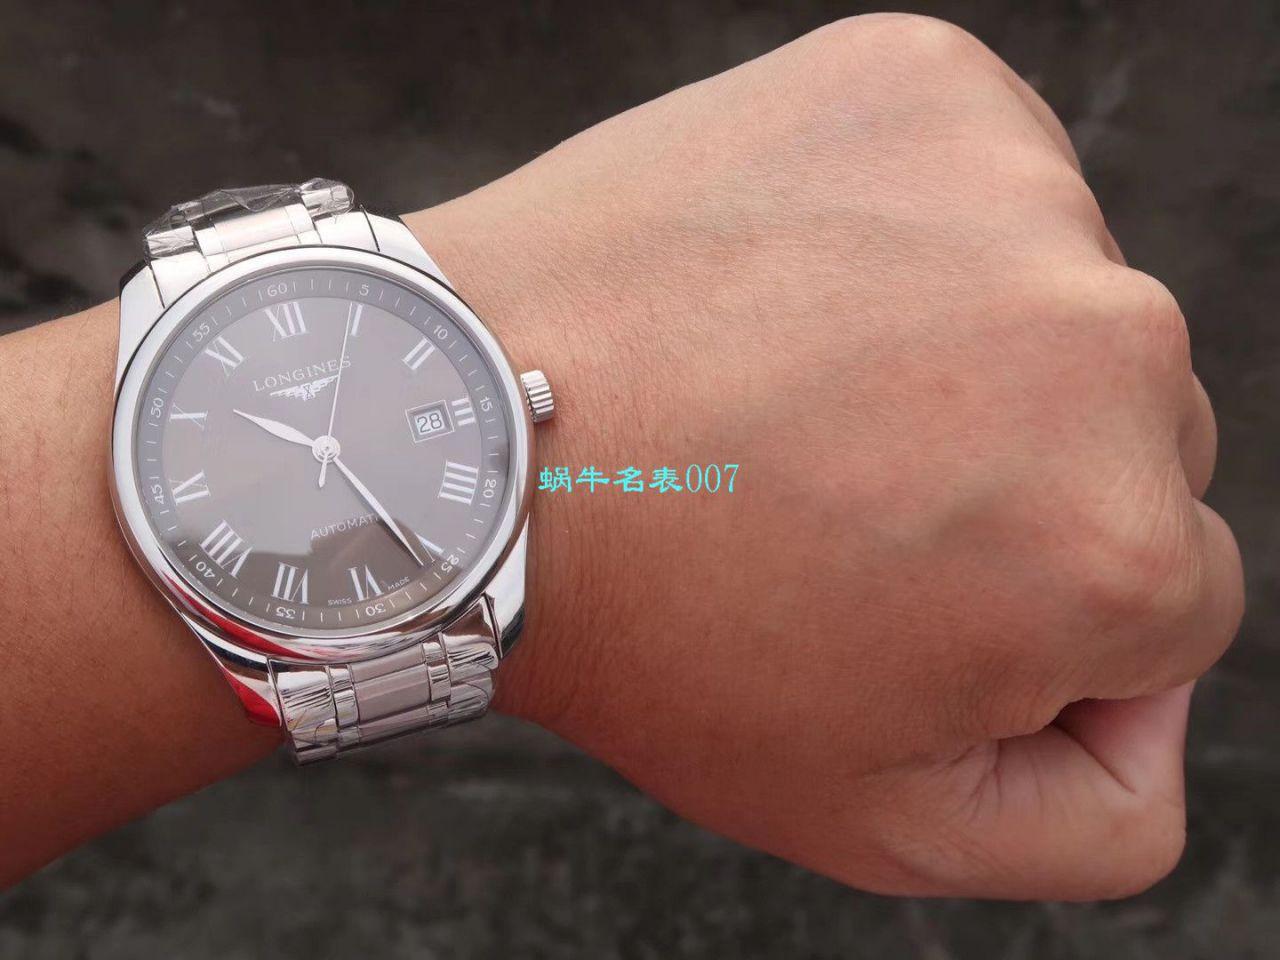 【V9厂顶级复刻手表】浪琴名匠单历系列L2.793.5.97.7腕表